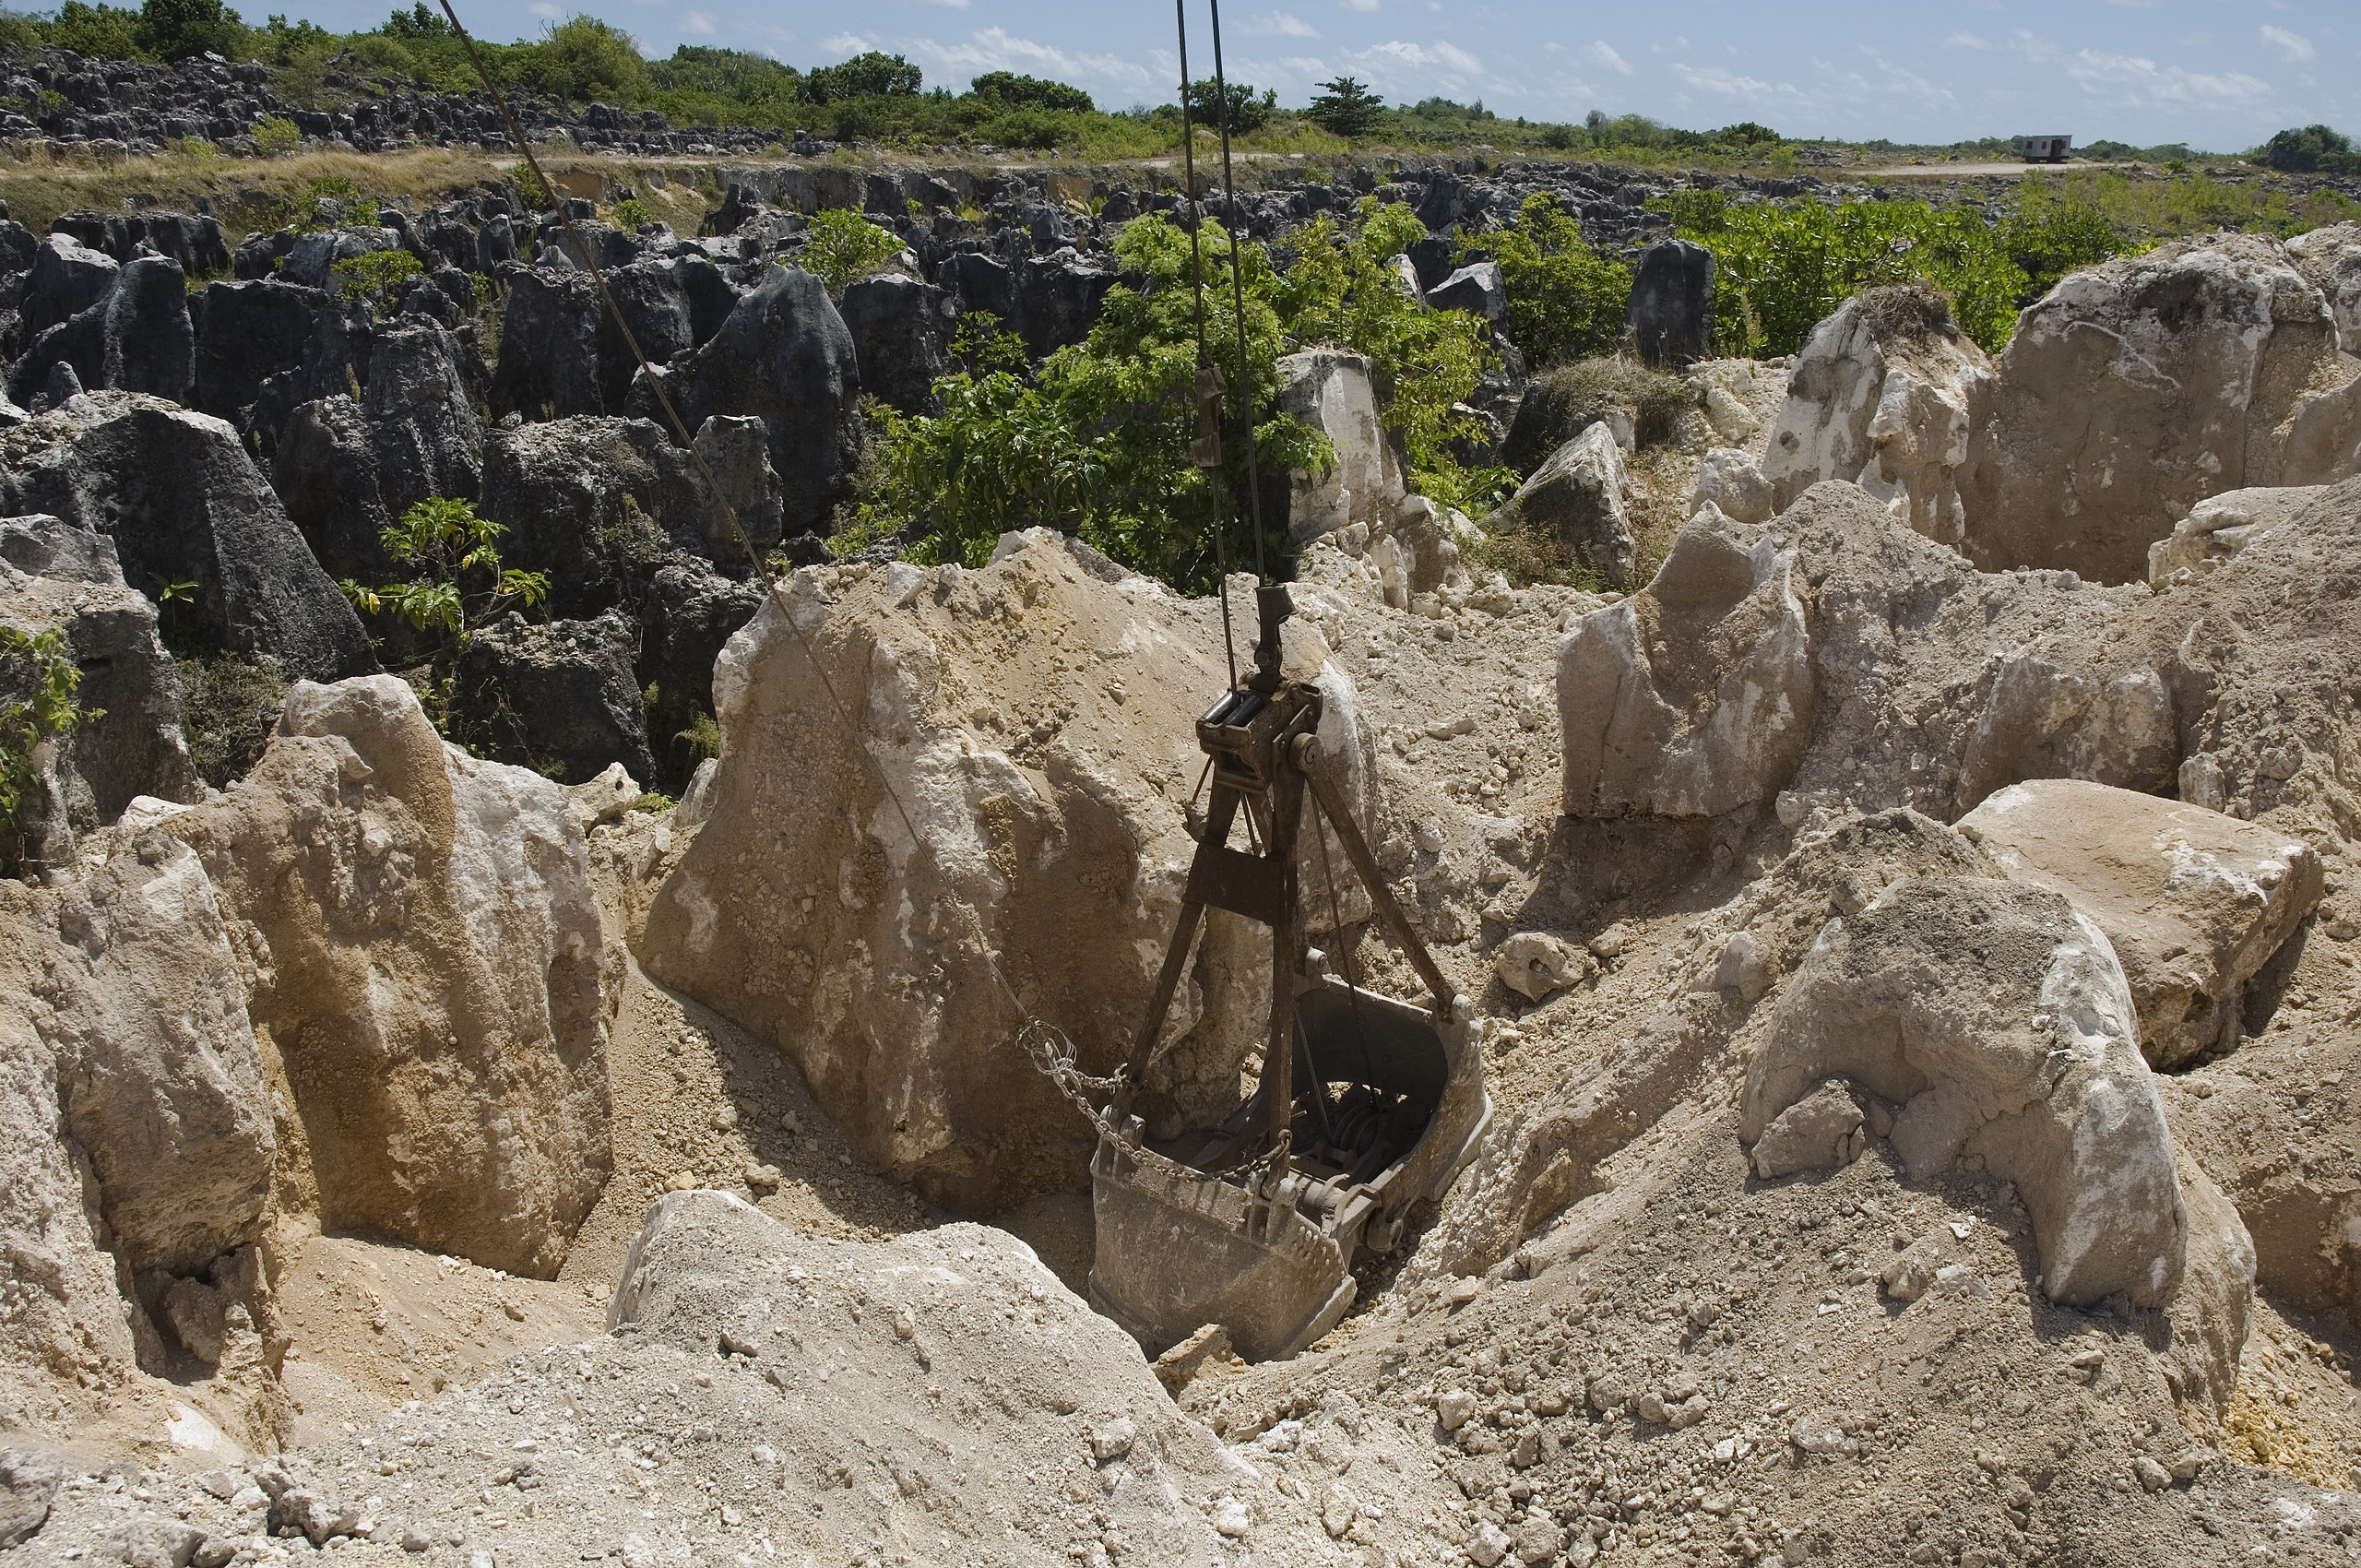 Bekas tambang Fosfat yang menganga lebar, membuat Nauru seperti permukaan bulan yang tandus   Photo by Lorrie Graham CC BY 2.0